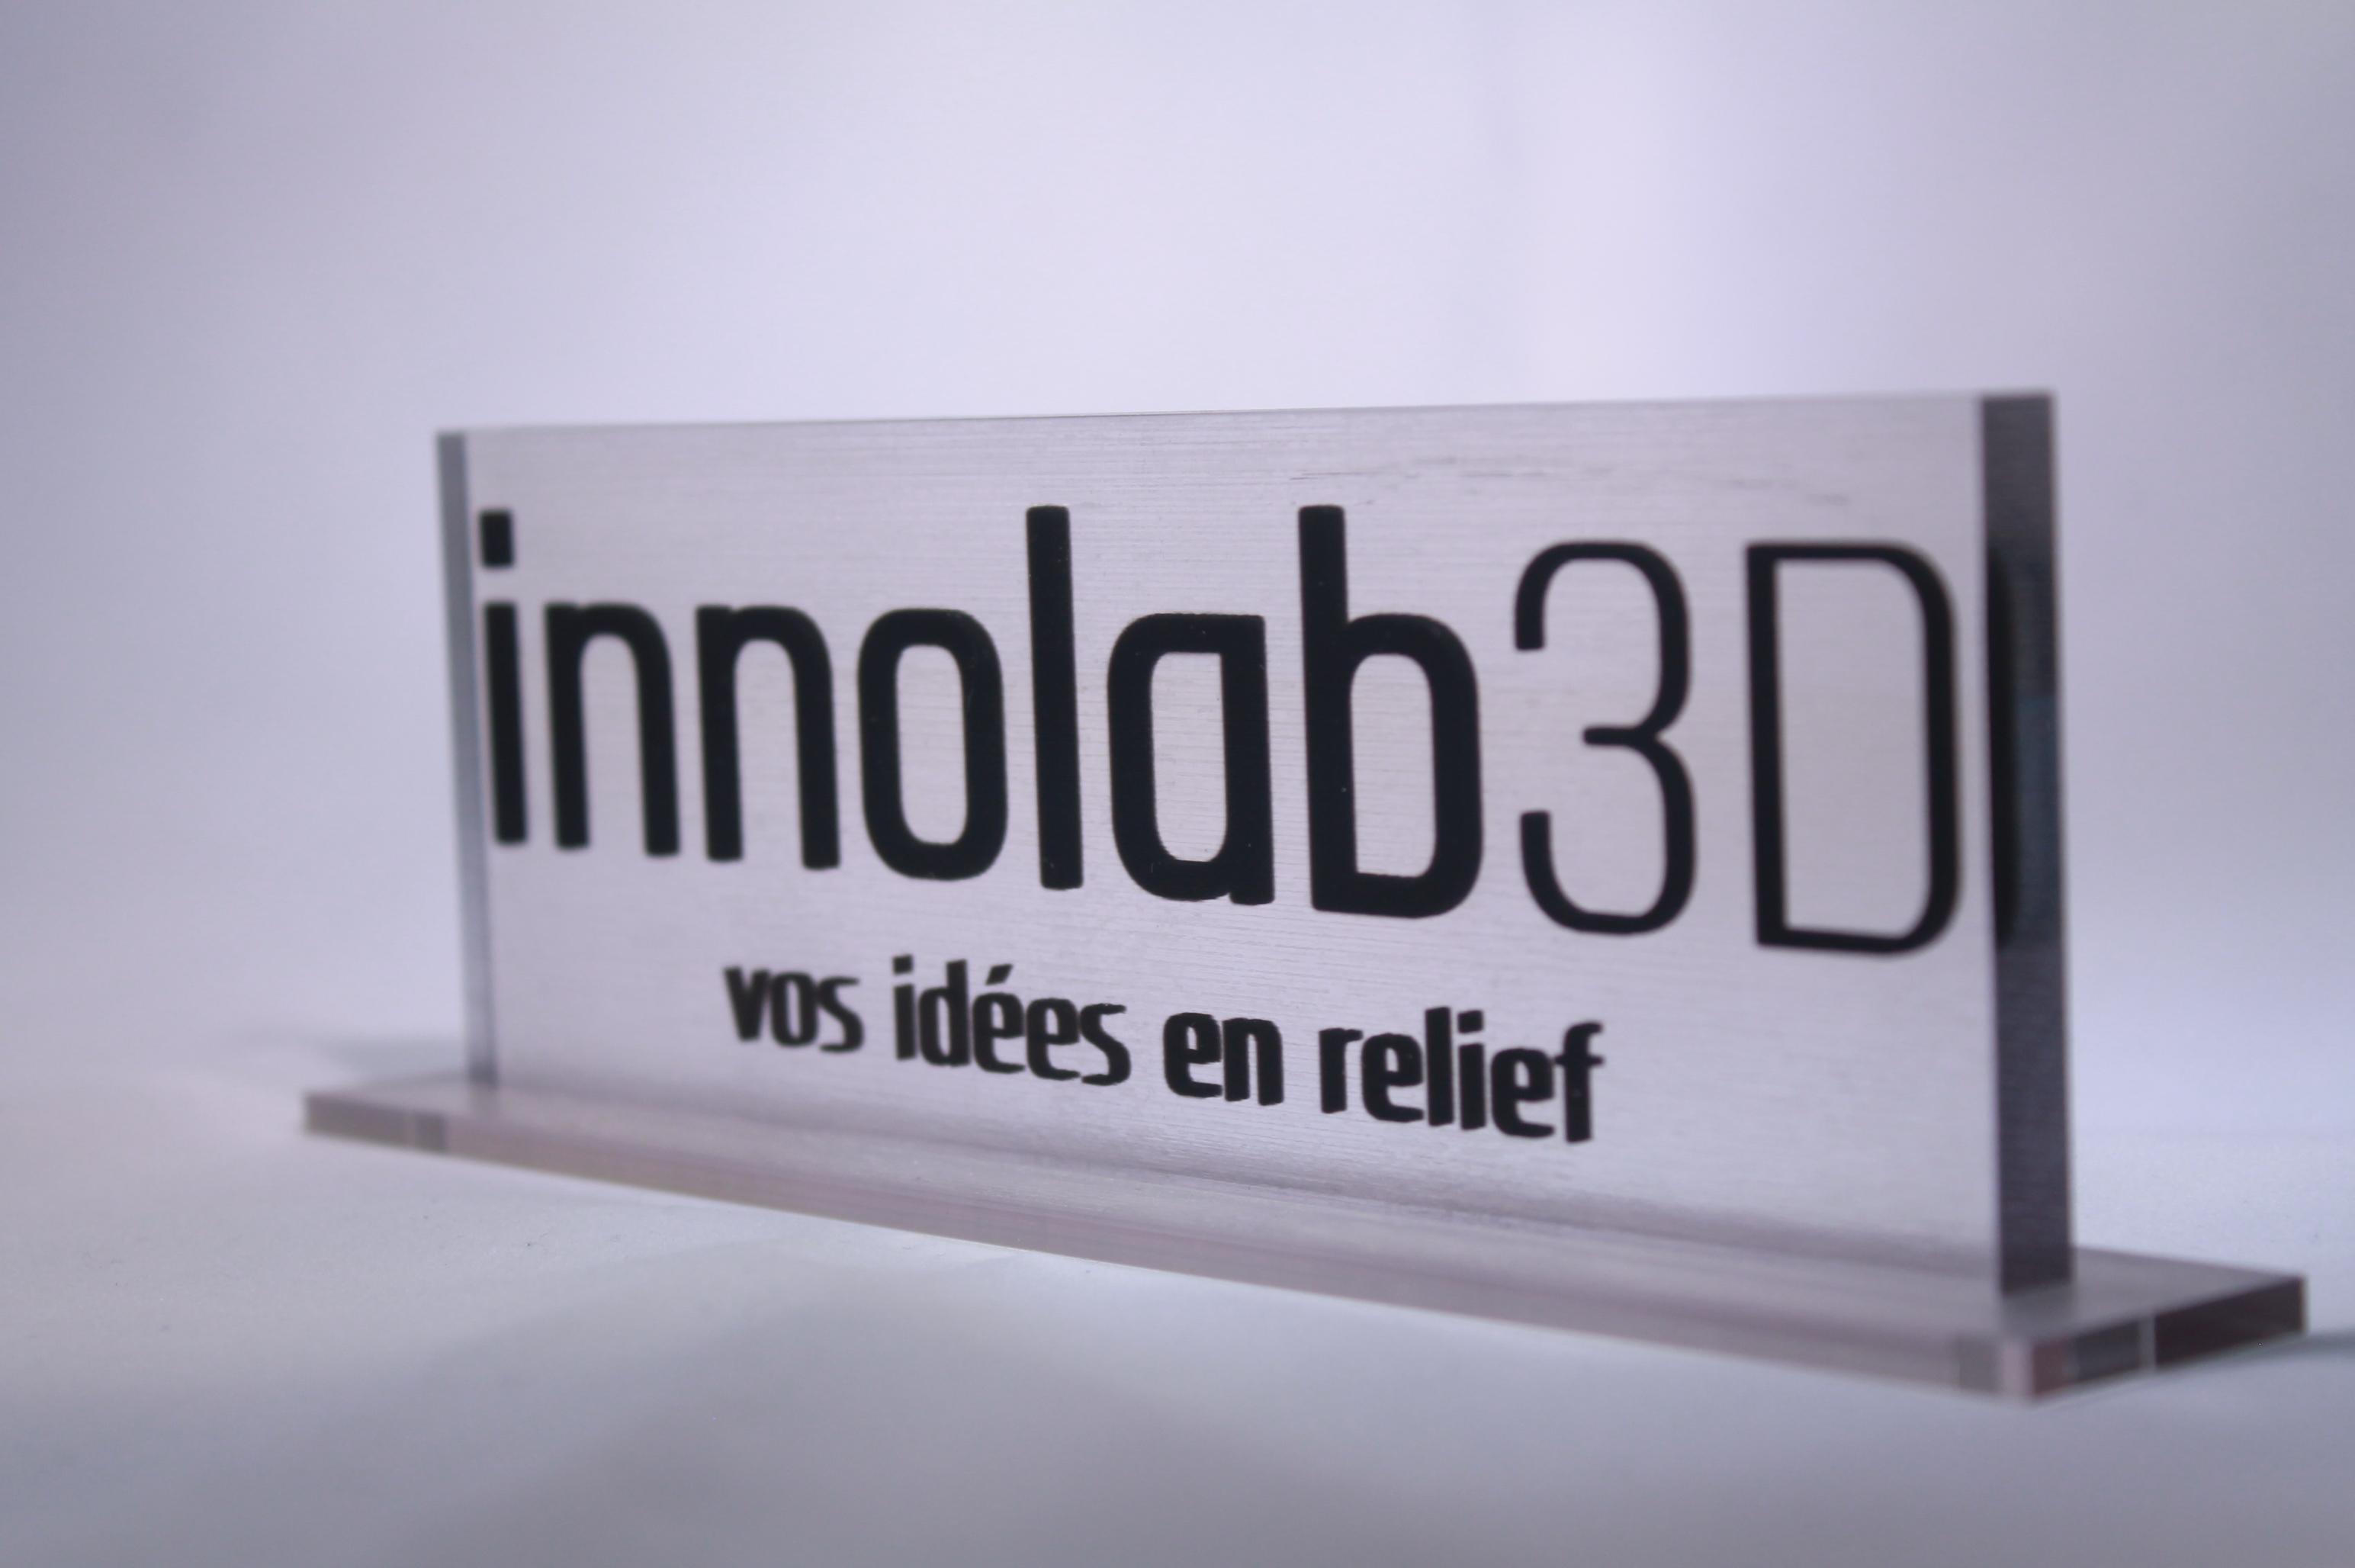 innolab3d realisation